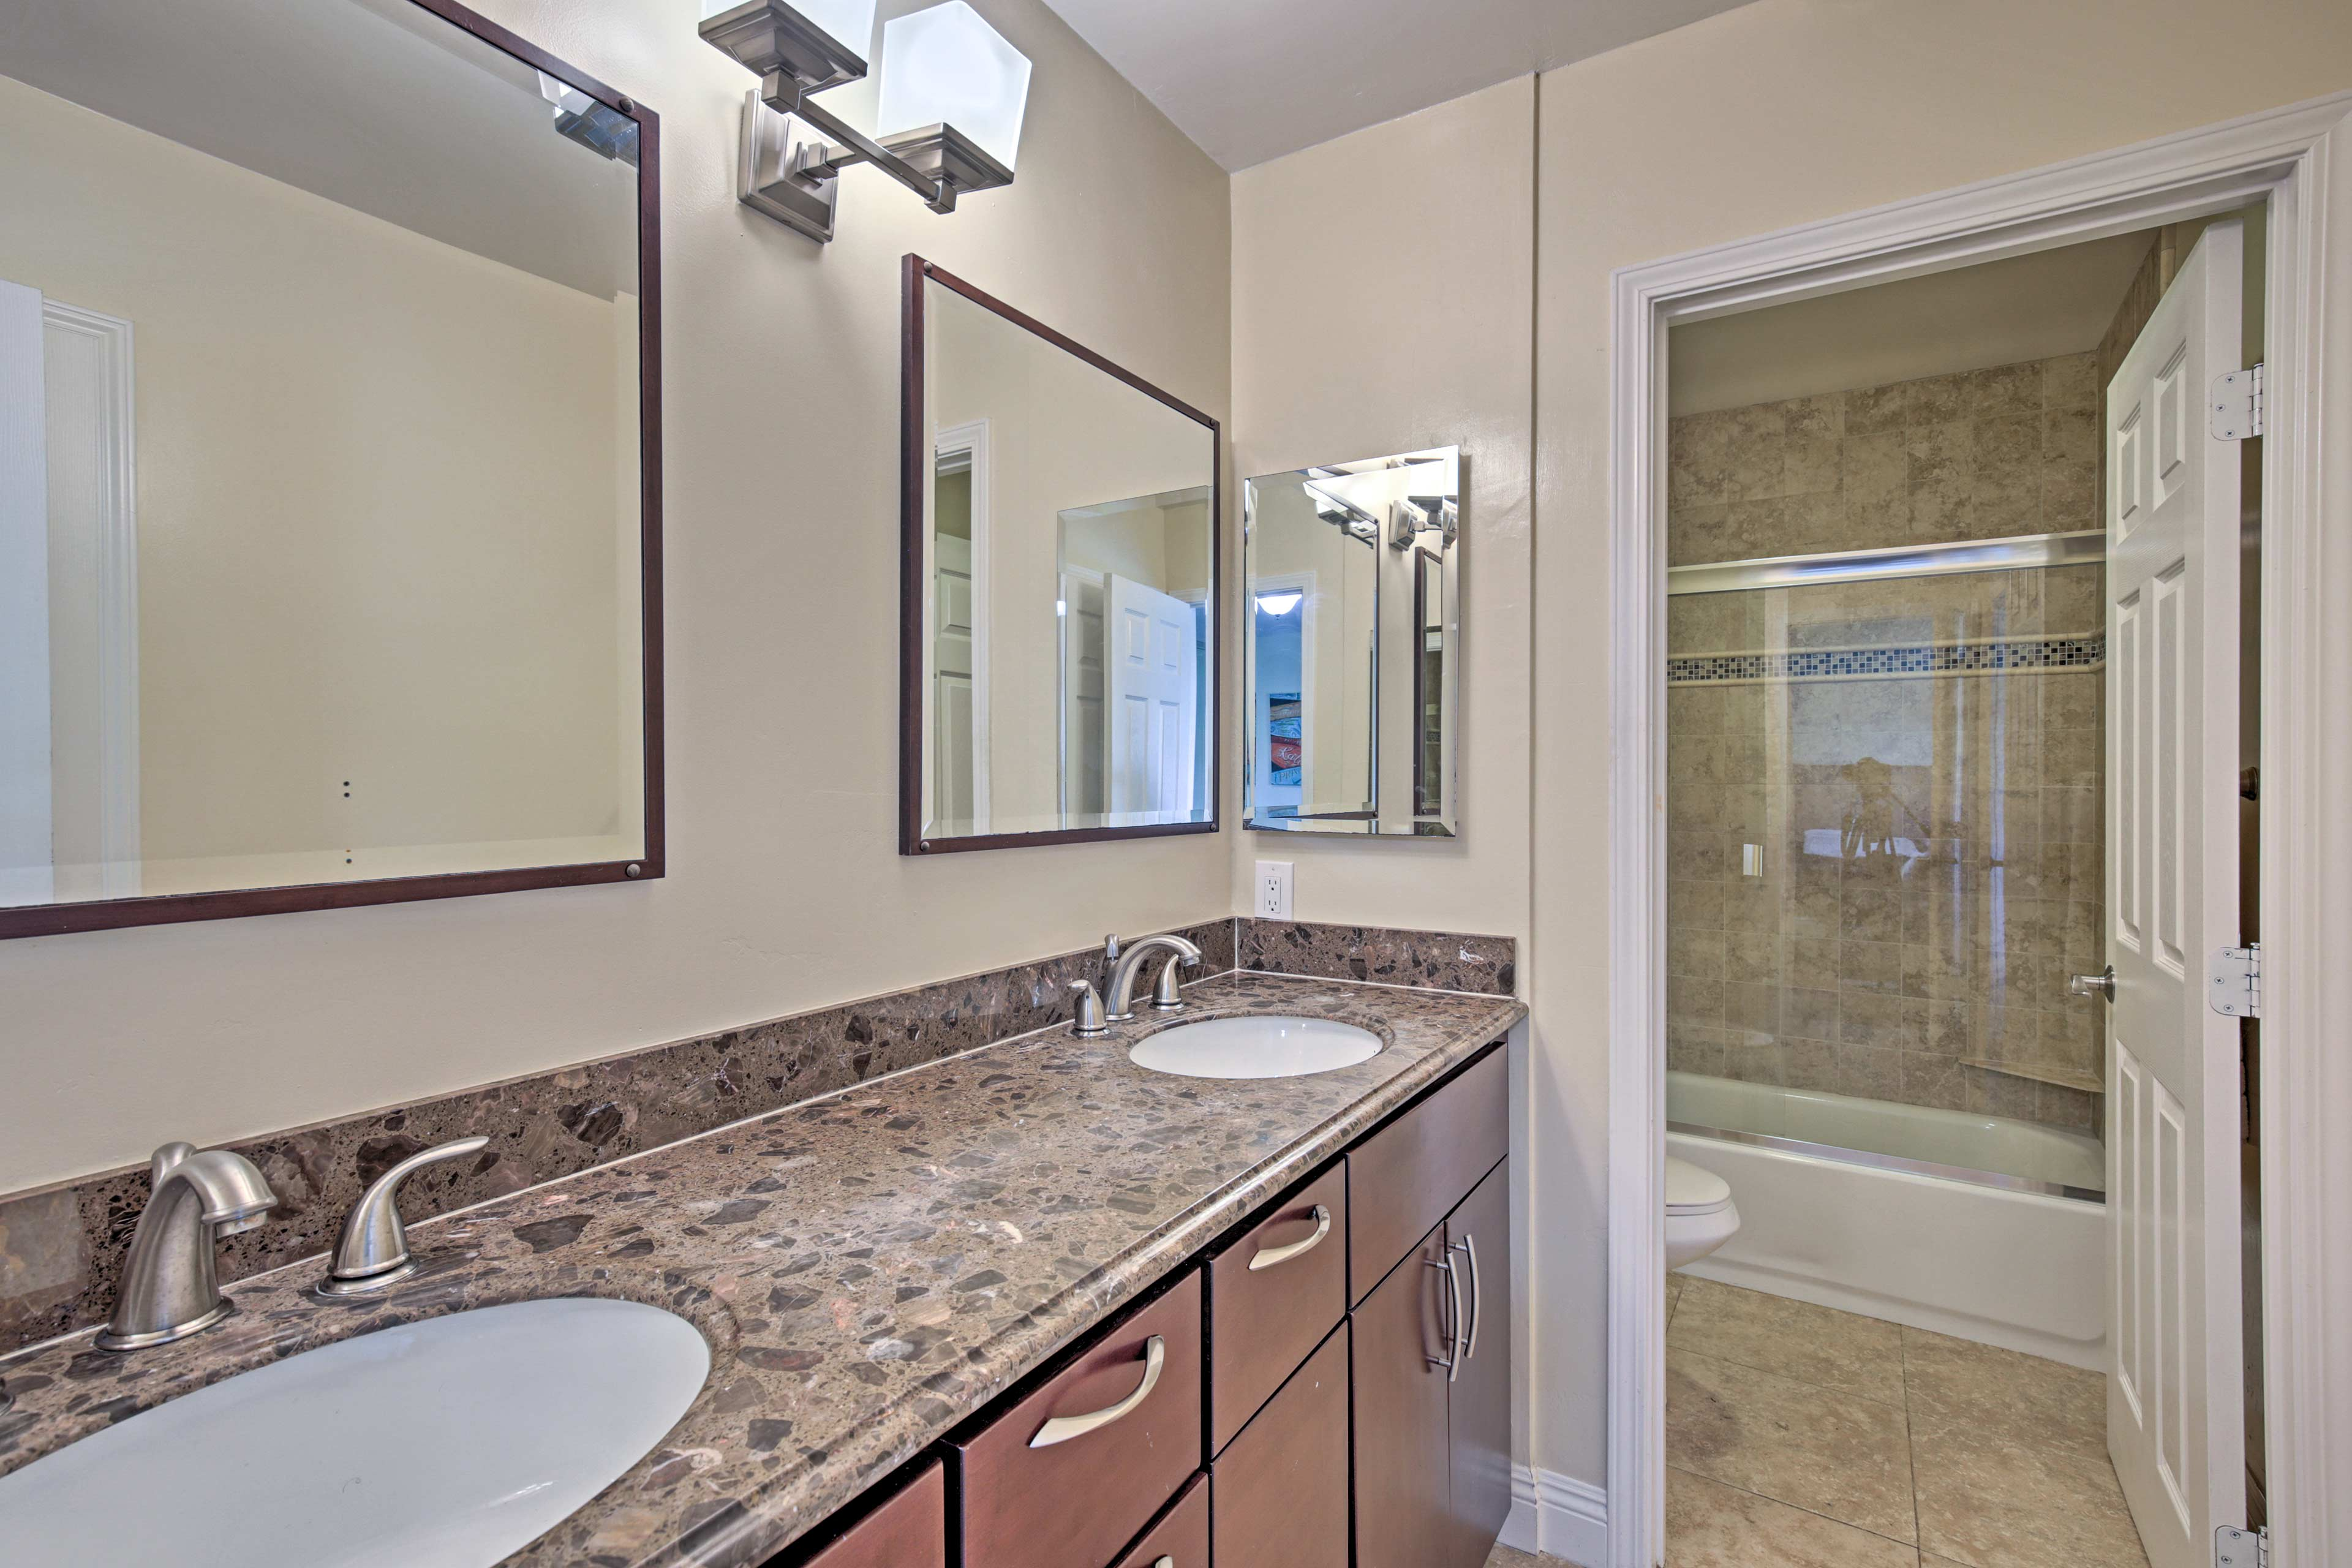 This bedroom also features a full en-suite bathroom.